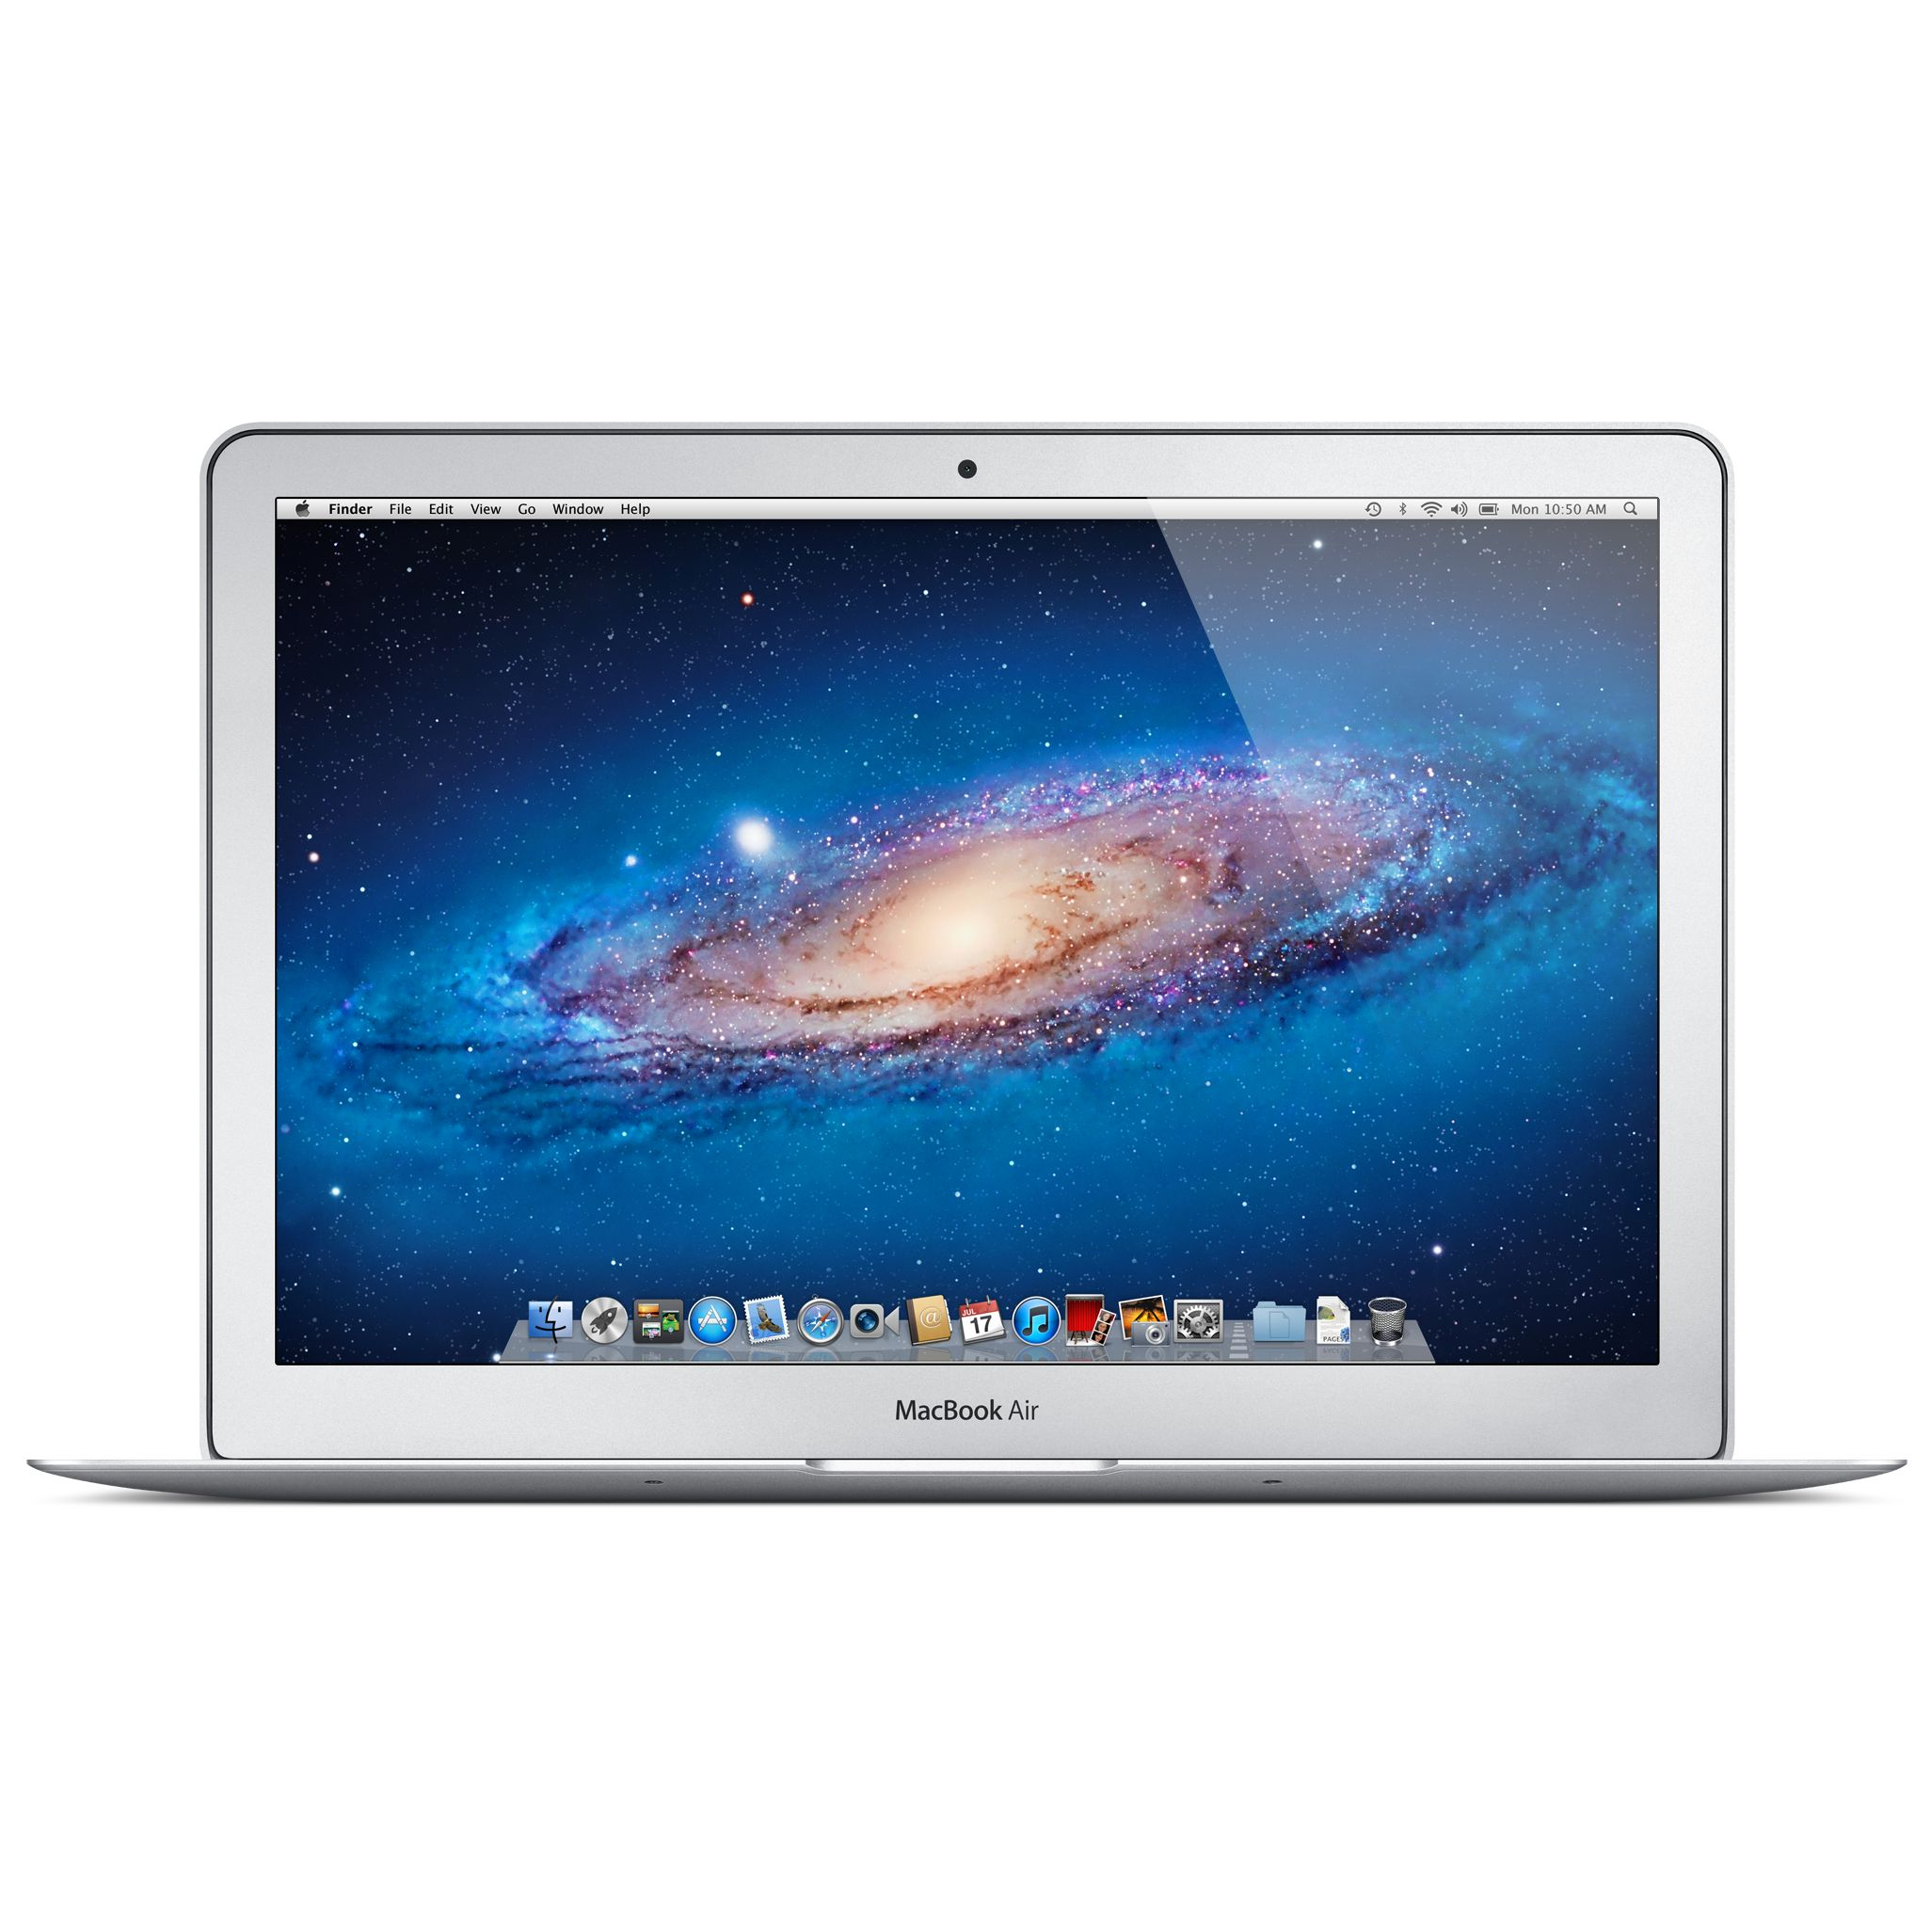 New Apple Macbook Air, Md223b/a, Intel Core I5, 1.7ghz, 64gb Ssd, 4gb Ram With 11.6 Inch Display